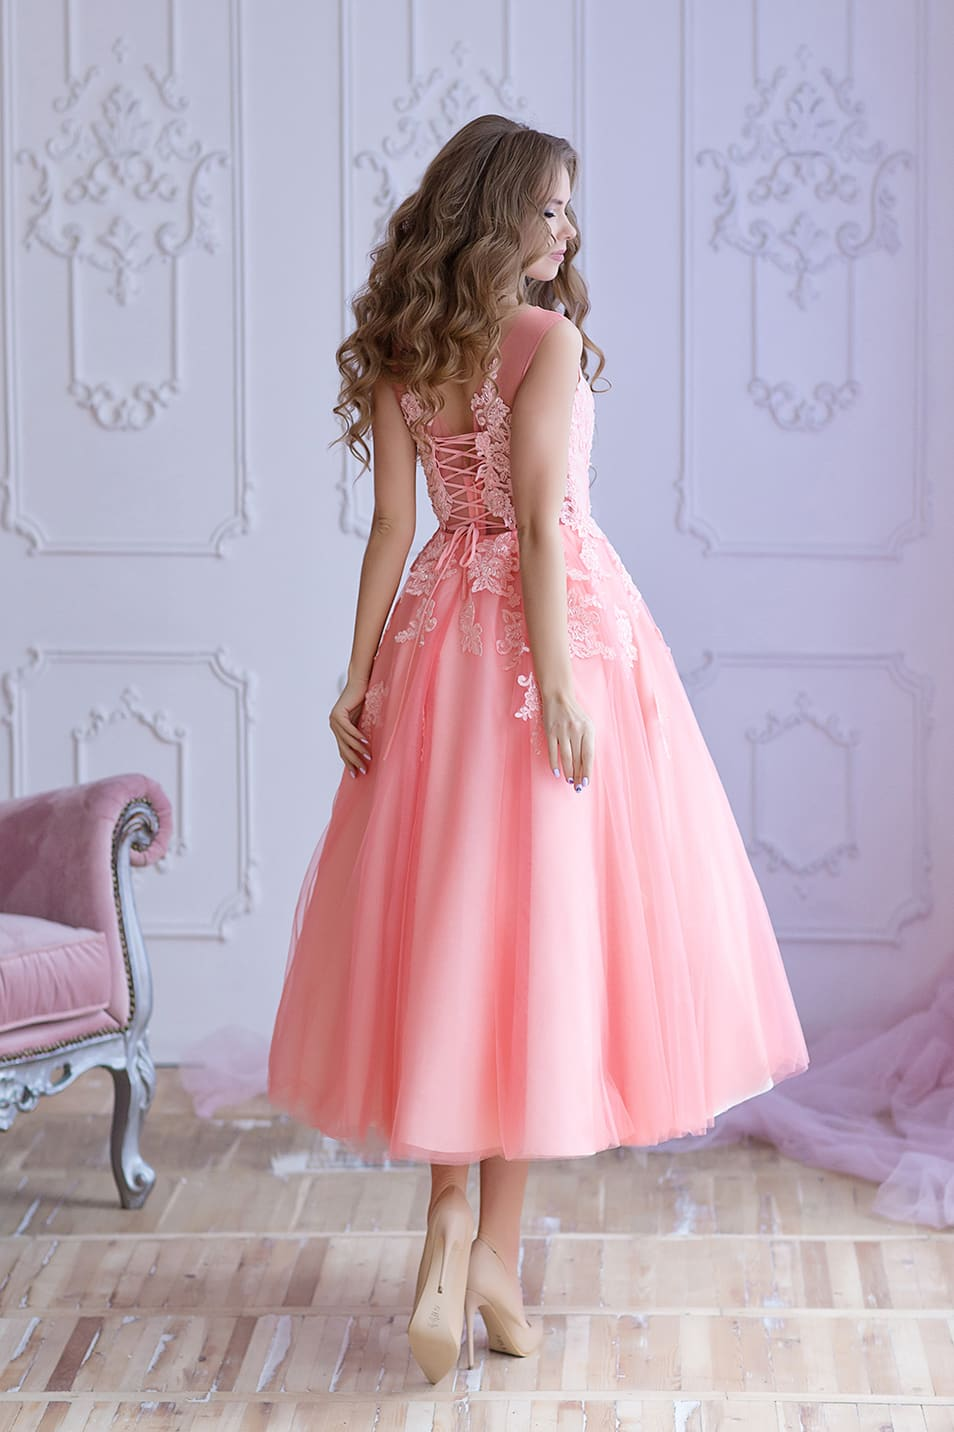 3290dca4eaa8 Вечернее платье Valentina Gladun Brian розовое. 🔍. new.  shop blout    shop dario